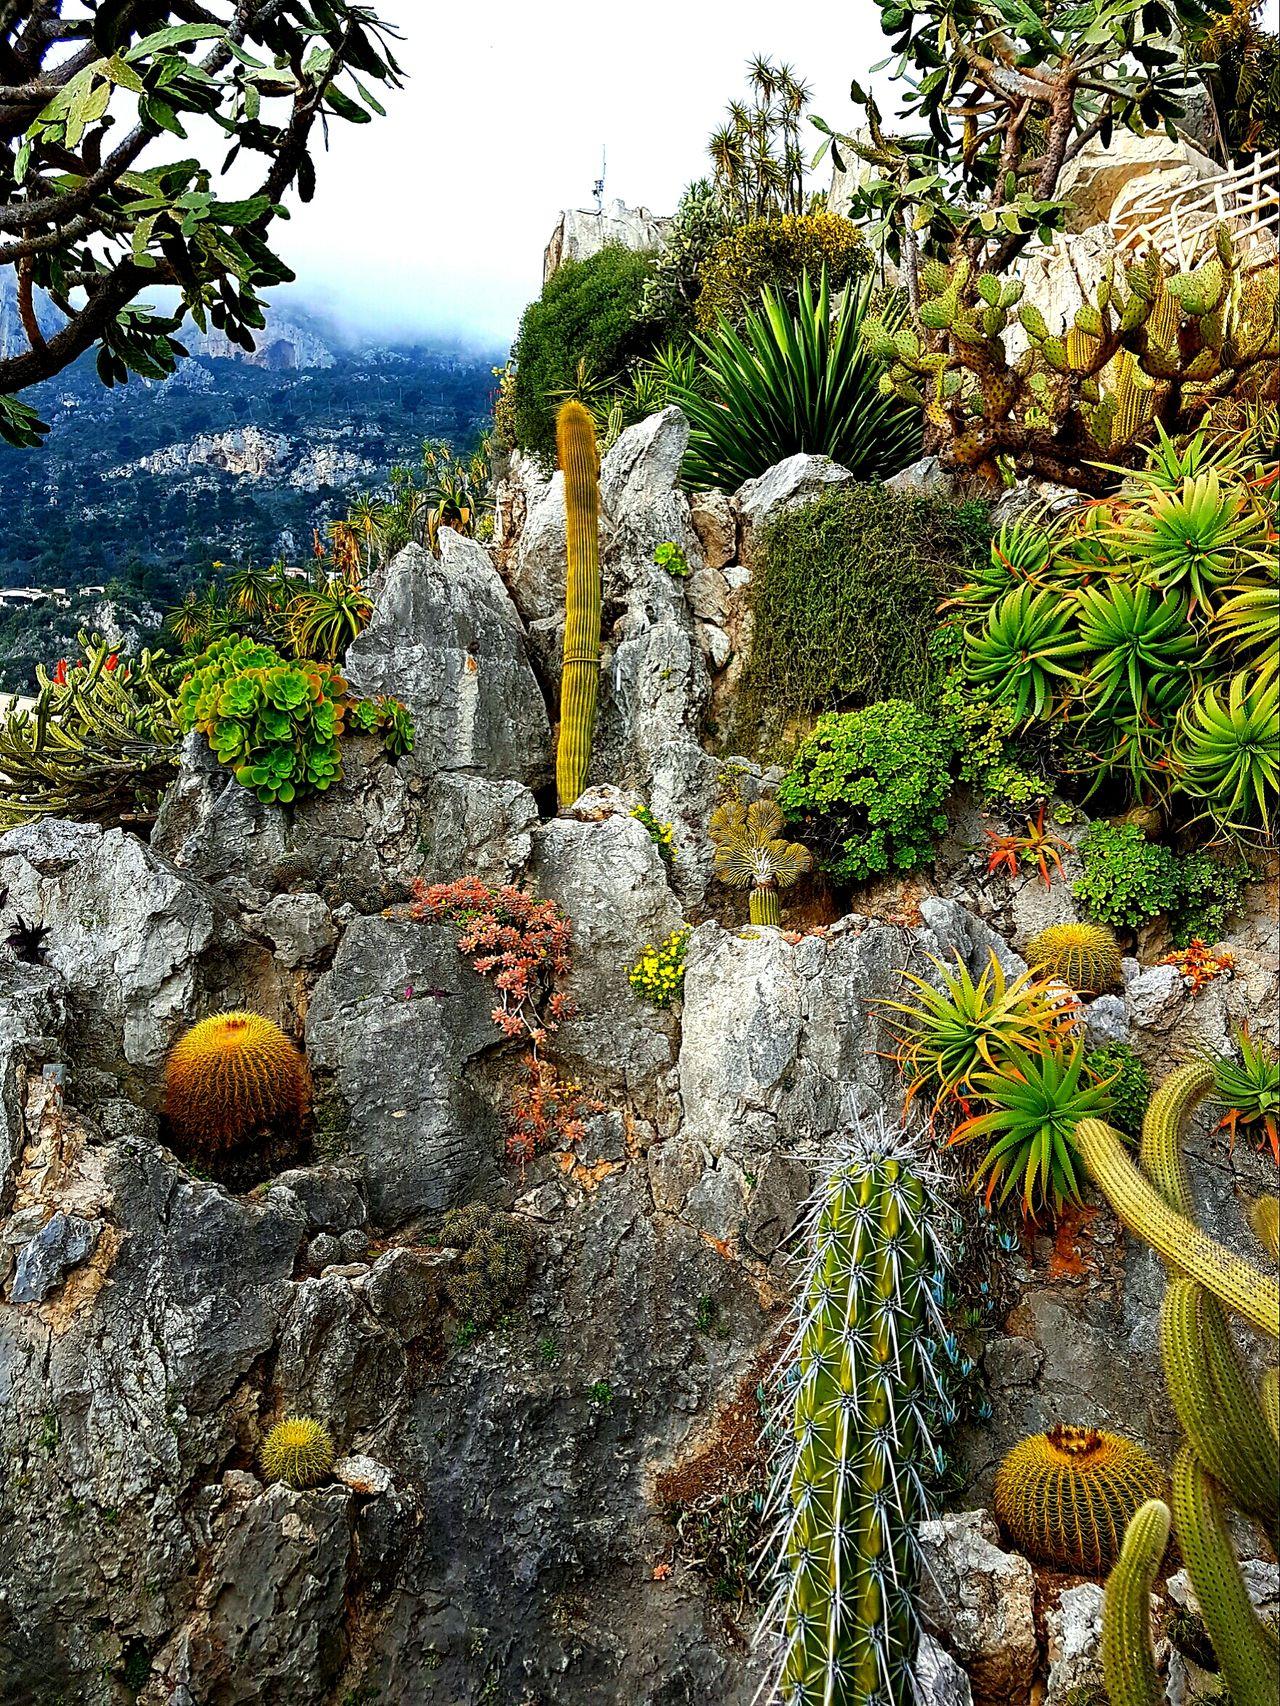 Monaco Beauty In Nature Plant Outdoors Cactus Cactus Garden Cactus Paradise Cactusplants